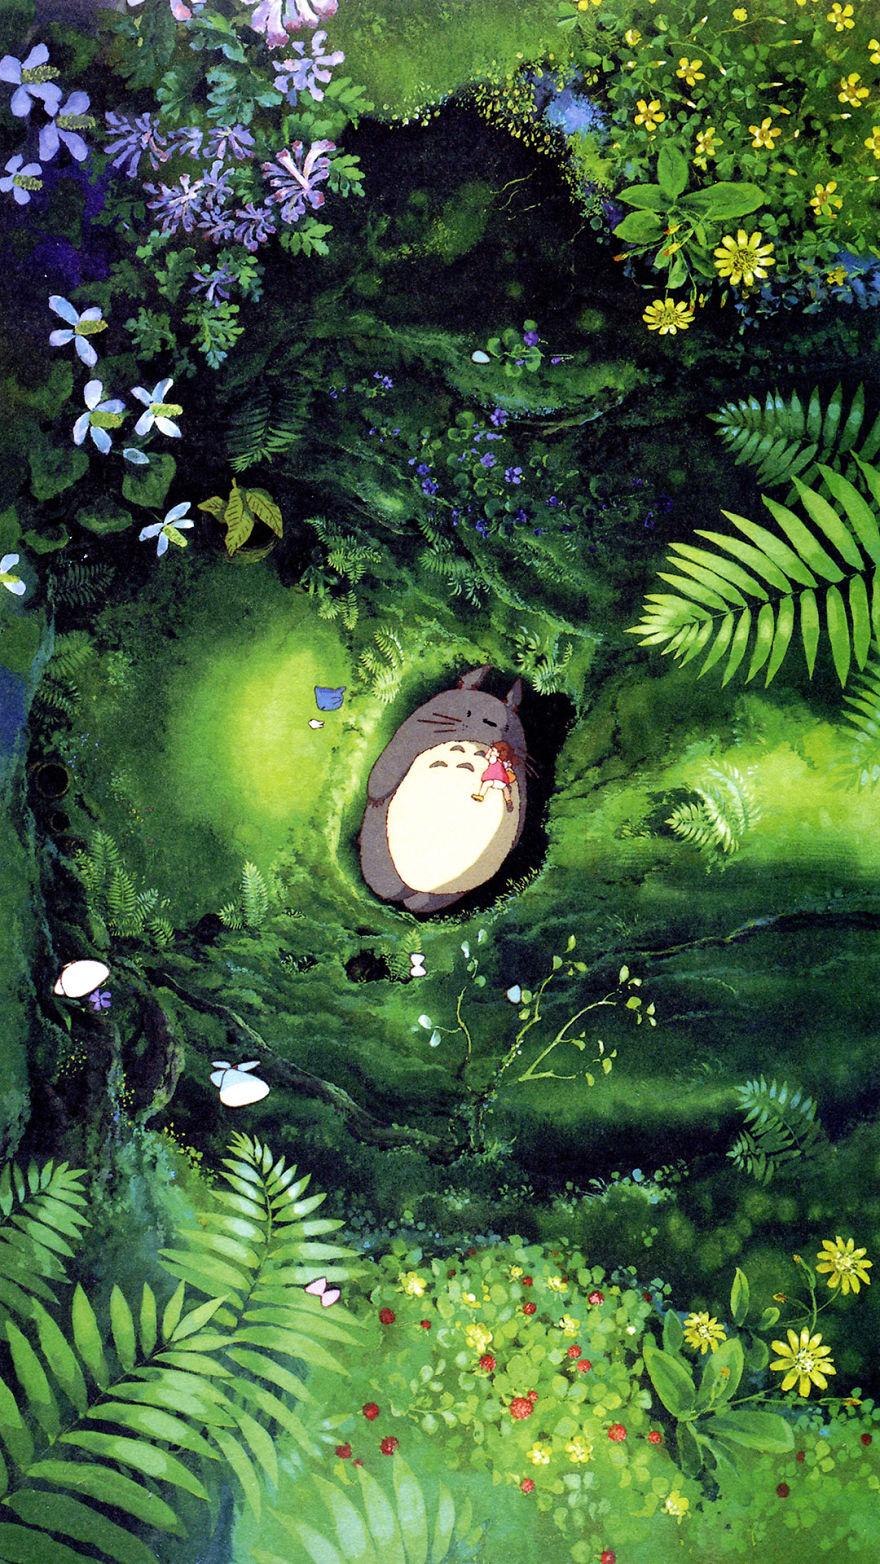 Studio Ghibli Dual Monitor Wallpaper Posted By John Sellers